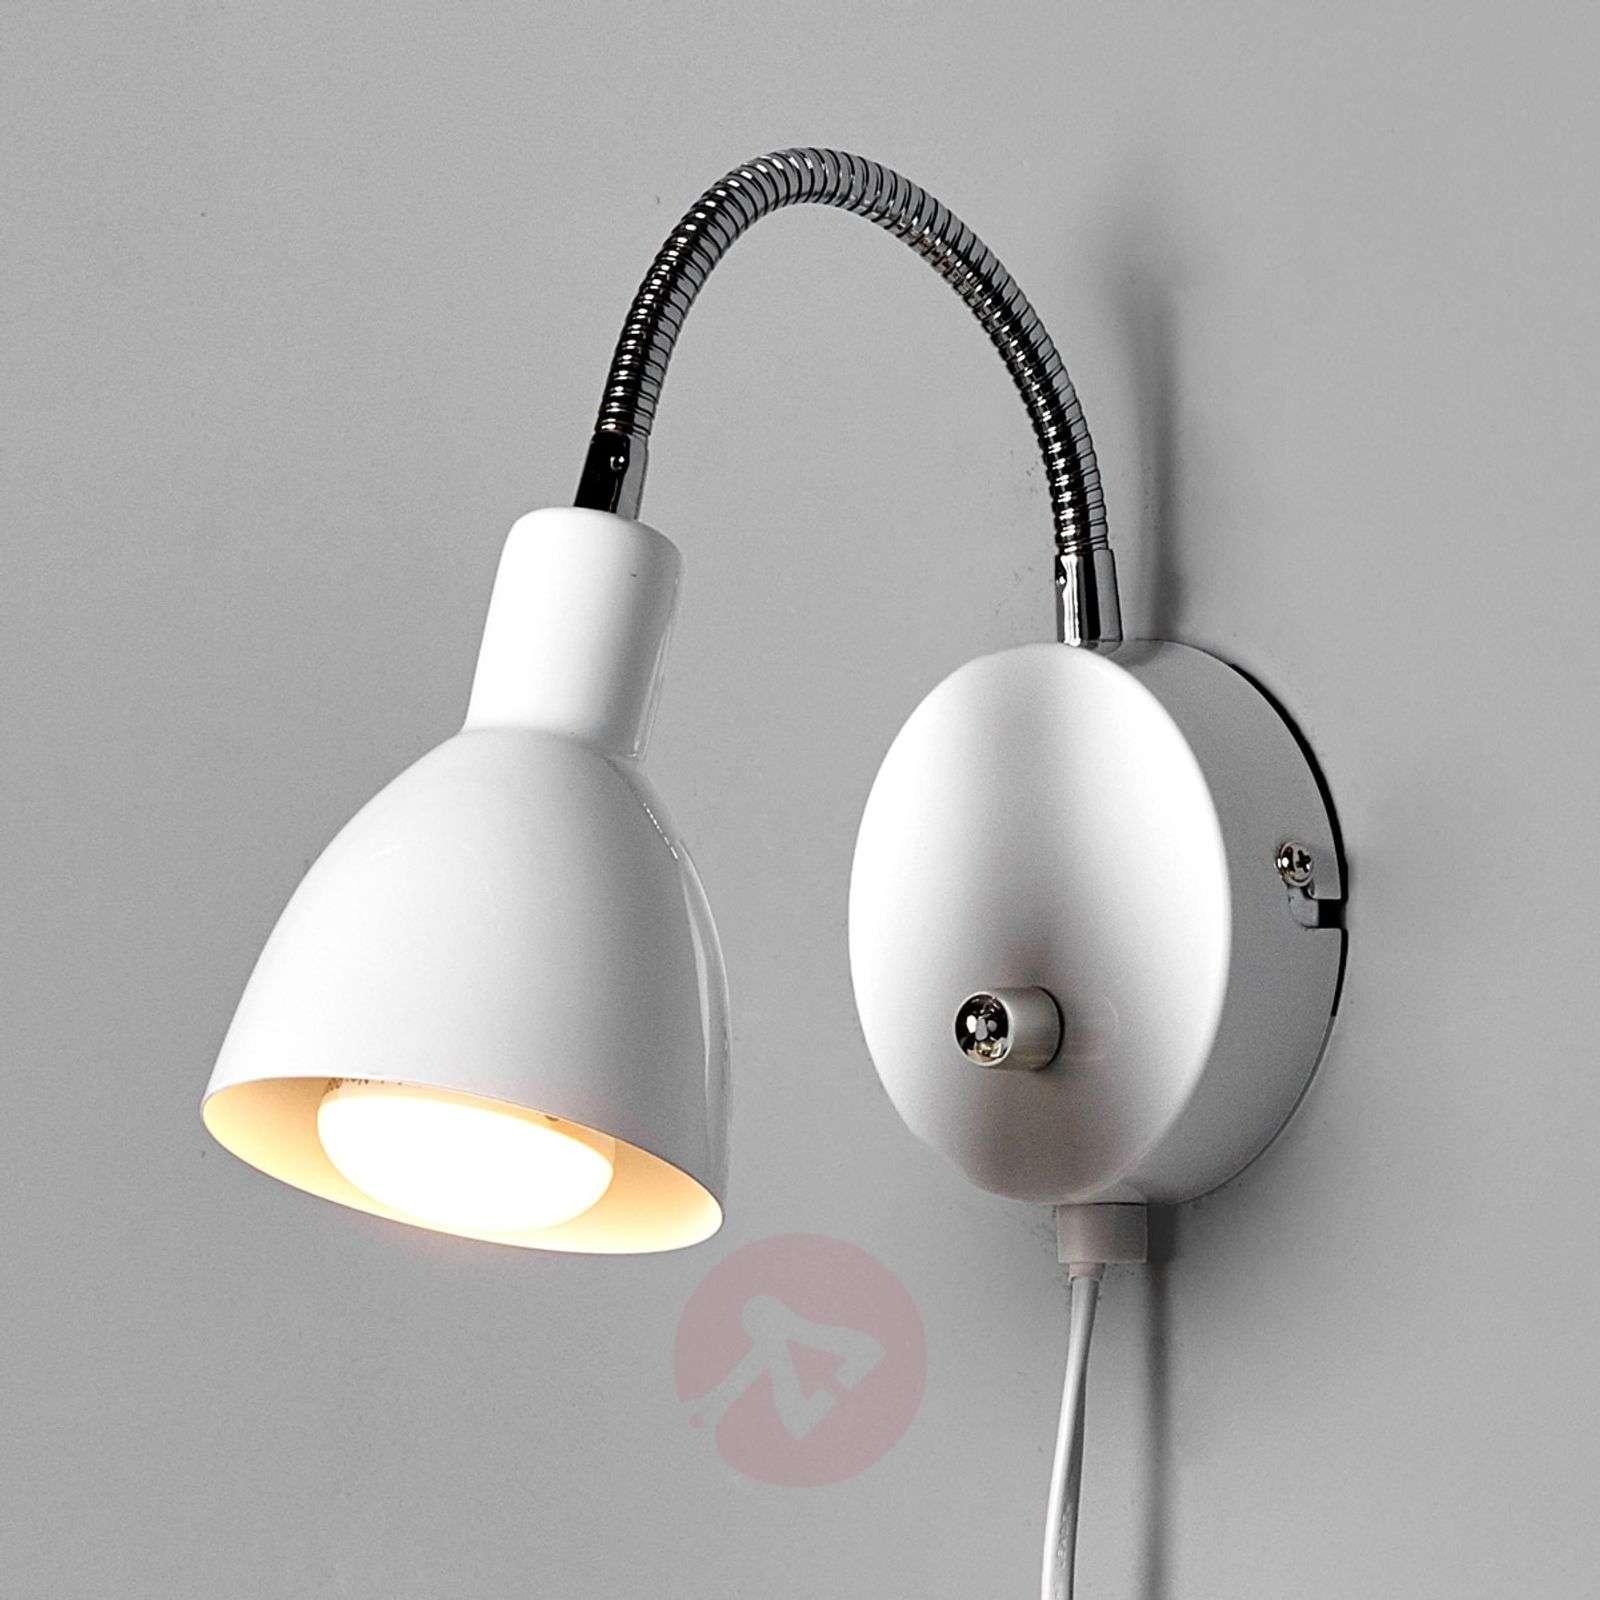 lights eaa min lowest veti led for lighting light dimmer incandescent and diy silver white